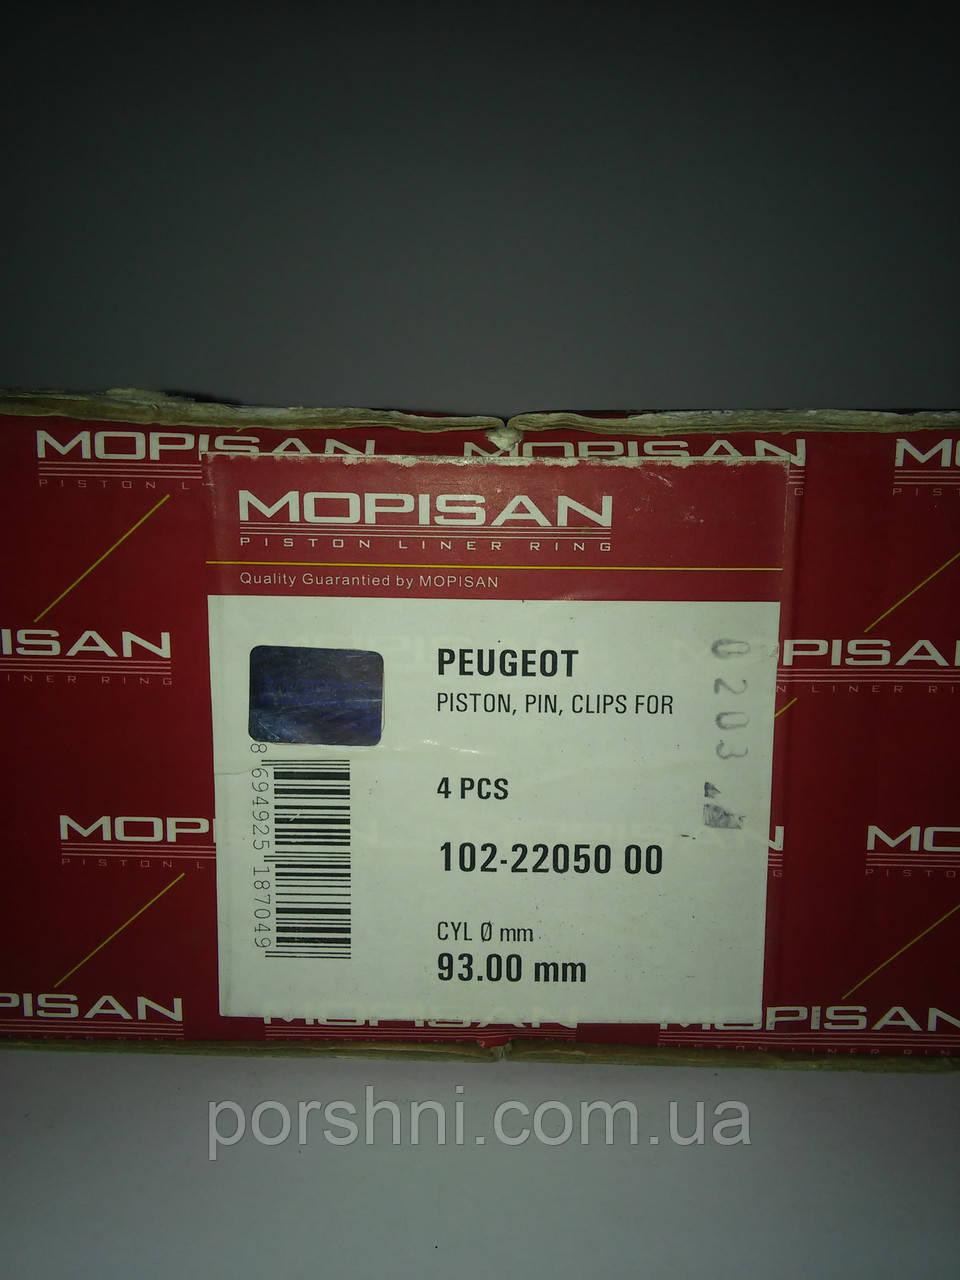 Поршня   Фиат Citroen  2.5 t.d ( 3 х 2х 4 )  диам 93 Mopisan 220500